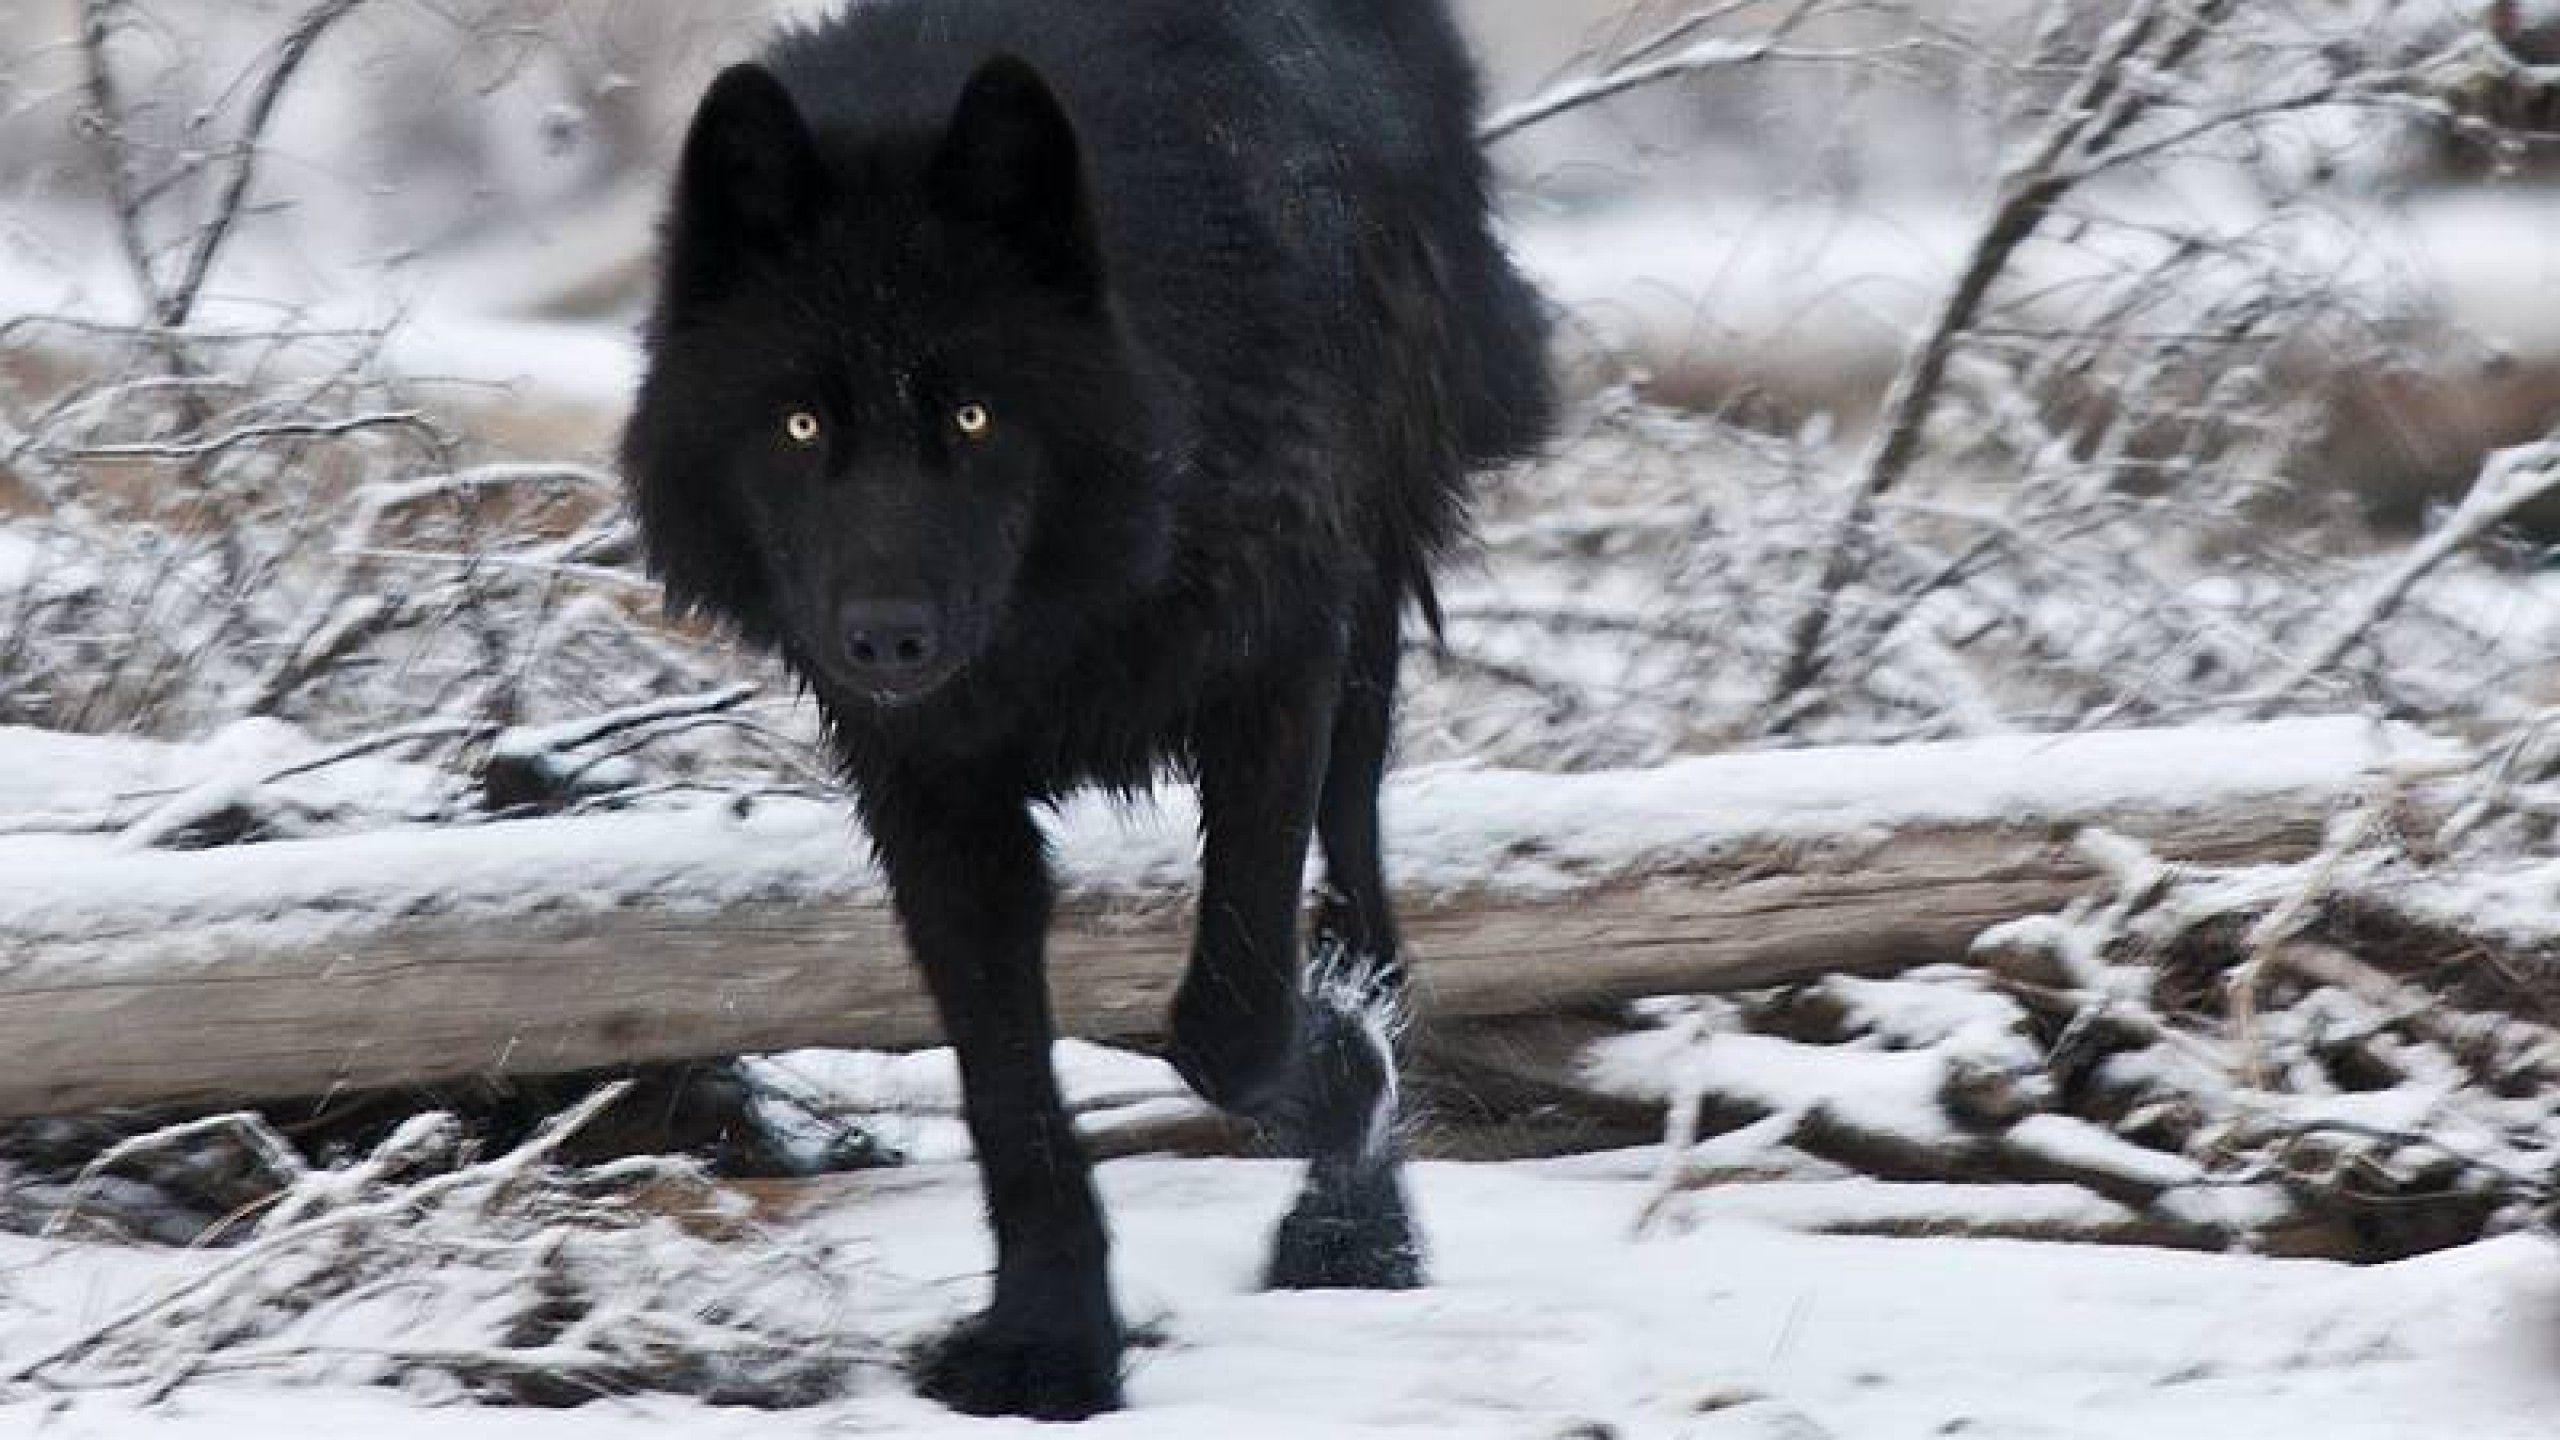 Black Wolf Wallpaper Hd Resolution With Hd Wallpaper Resolution